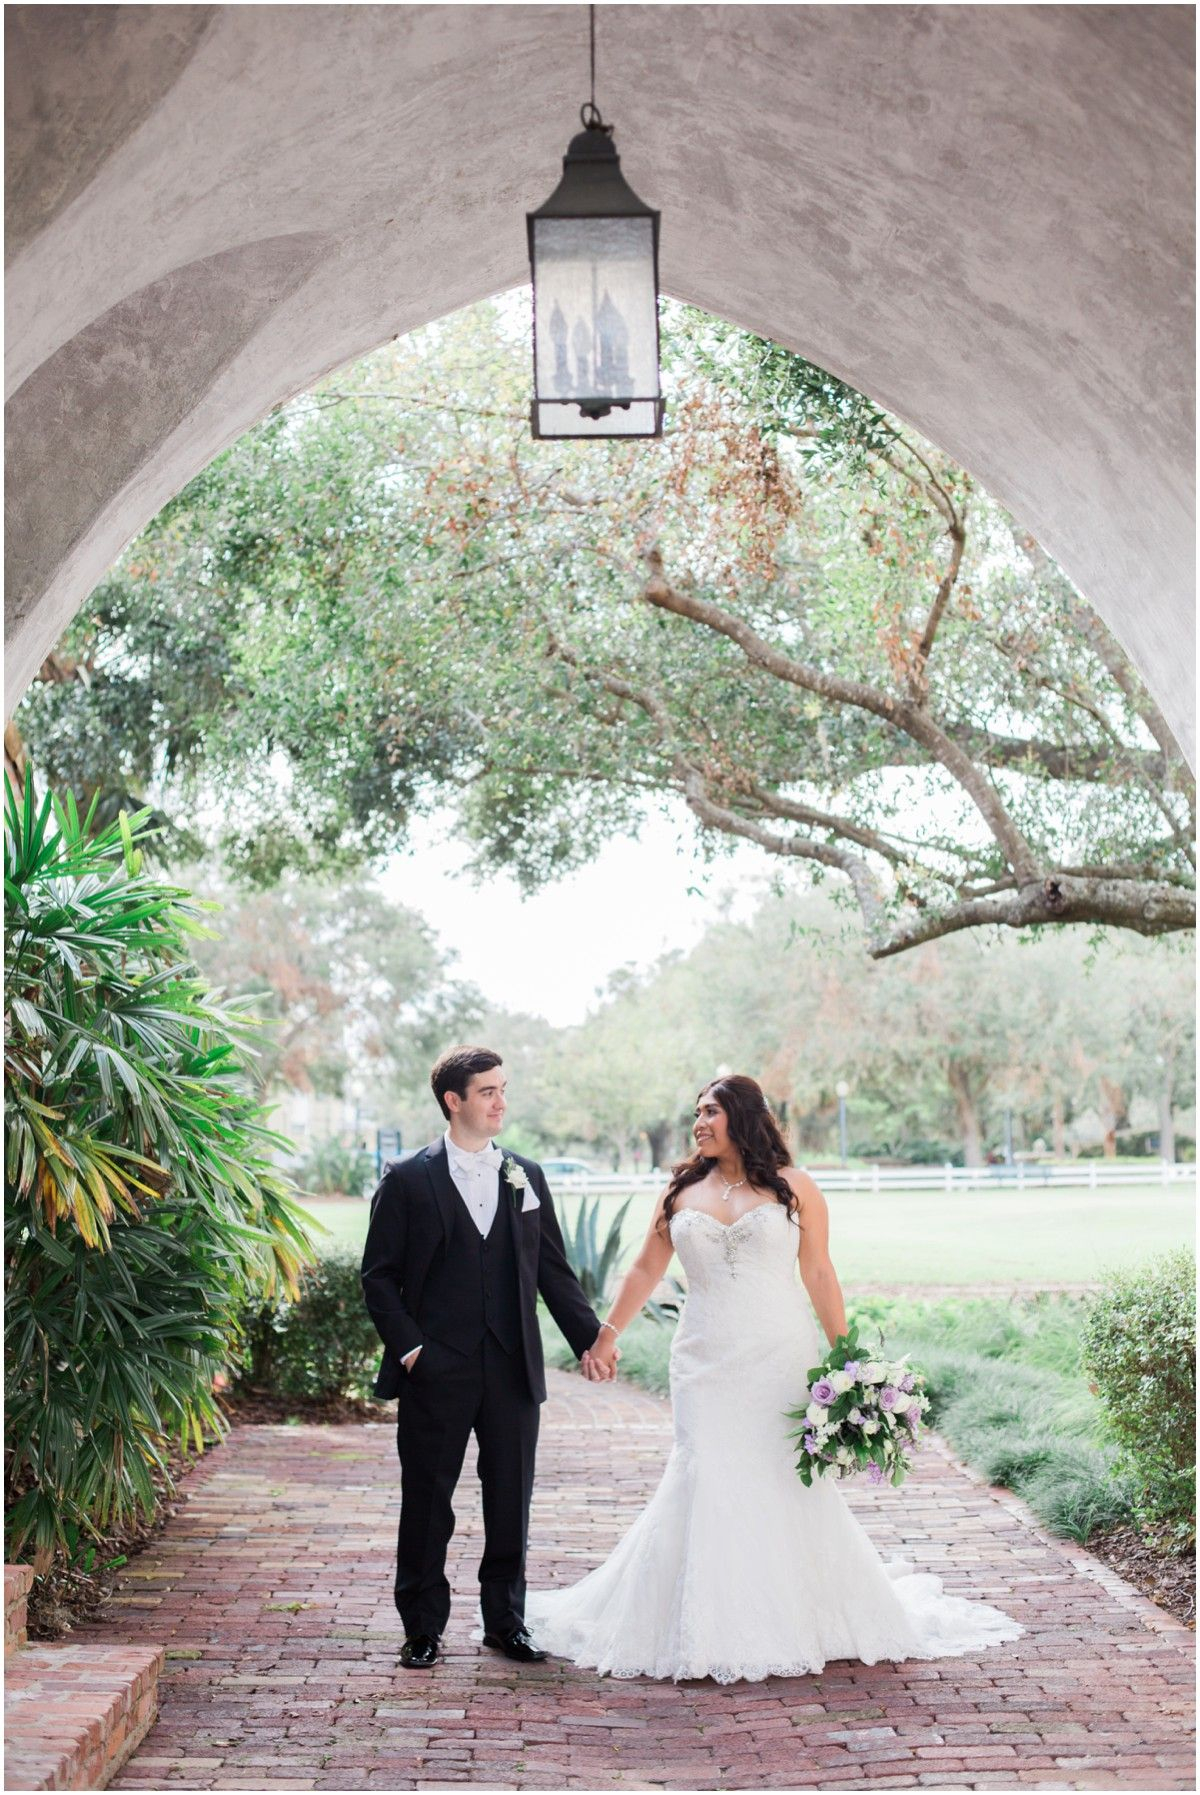 Weddings At Casa Feliz Winter Park Fl Kristen Browning Photography Historic Florida Wedding Venue: Winter Wedding Venues In Florida At Reisefeber.org